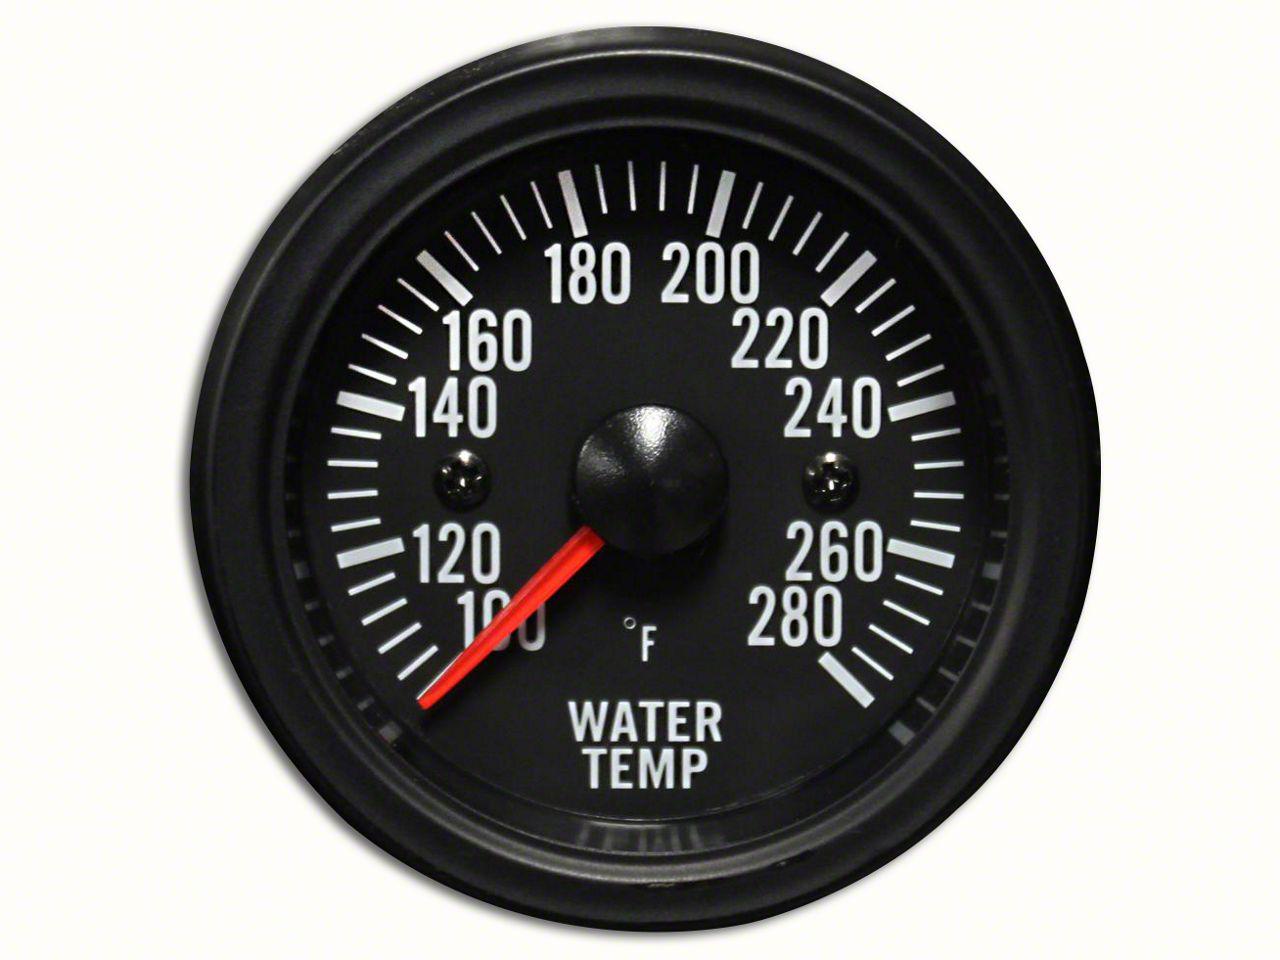 Prosport White LED Water Temperature Gauge - Electrical (97-19 Jeep Wrangler TJ, JK & JL)